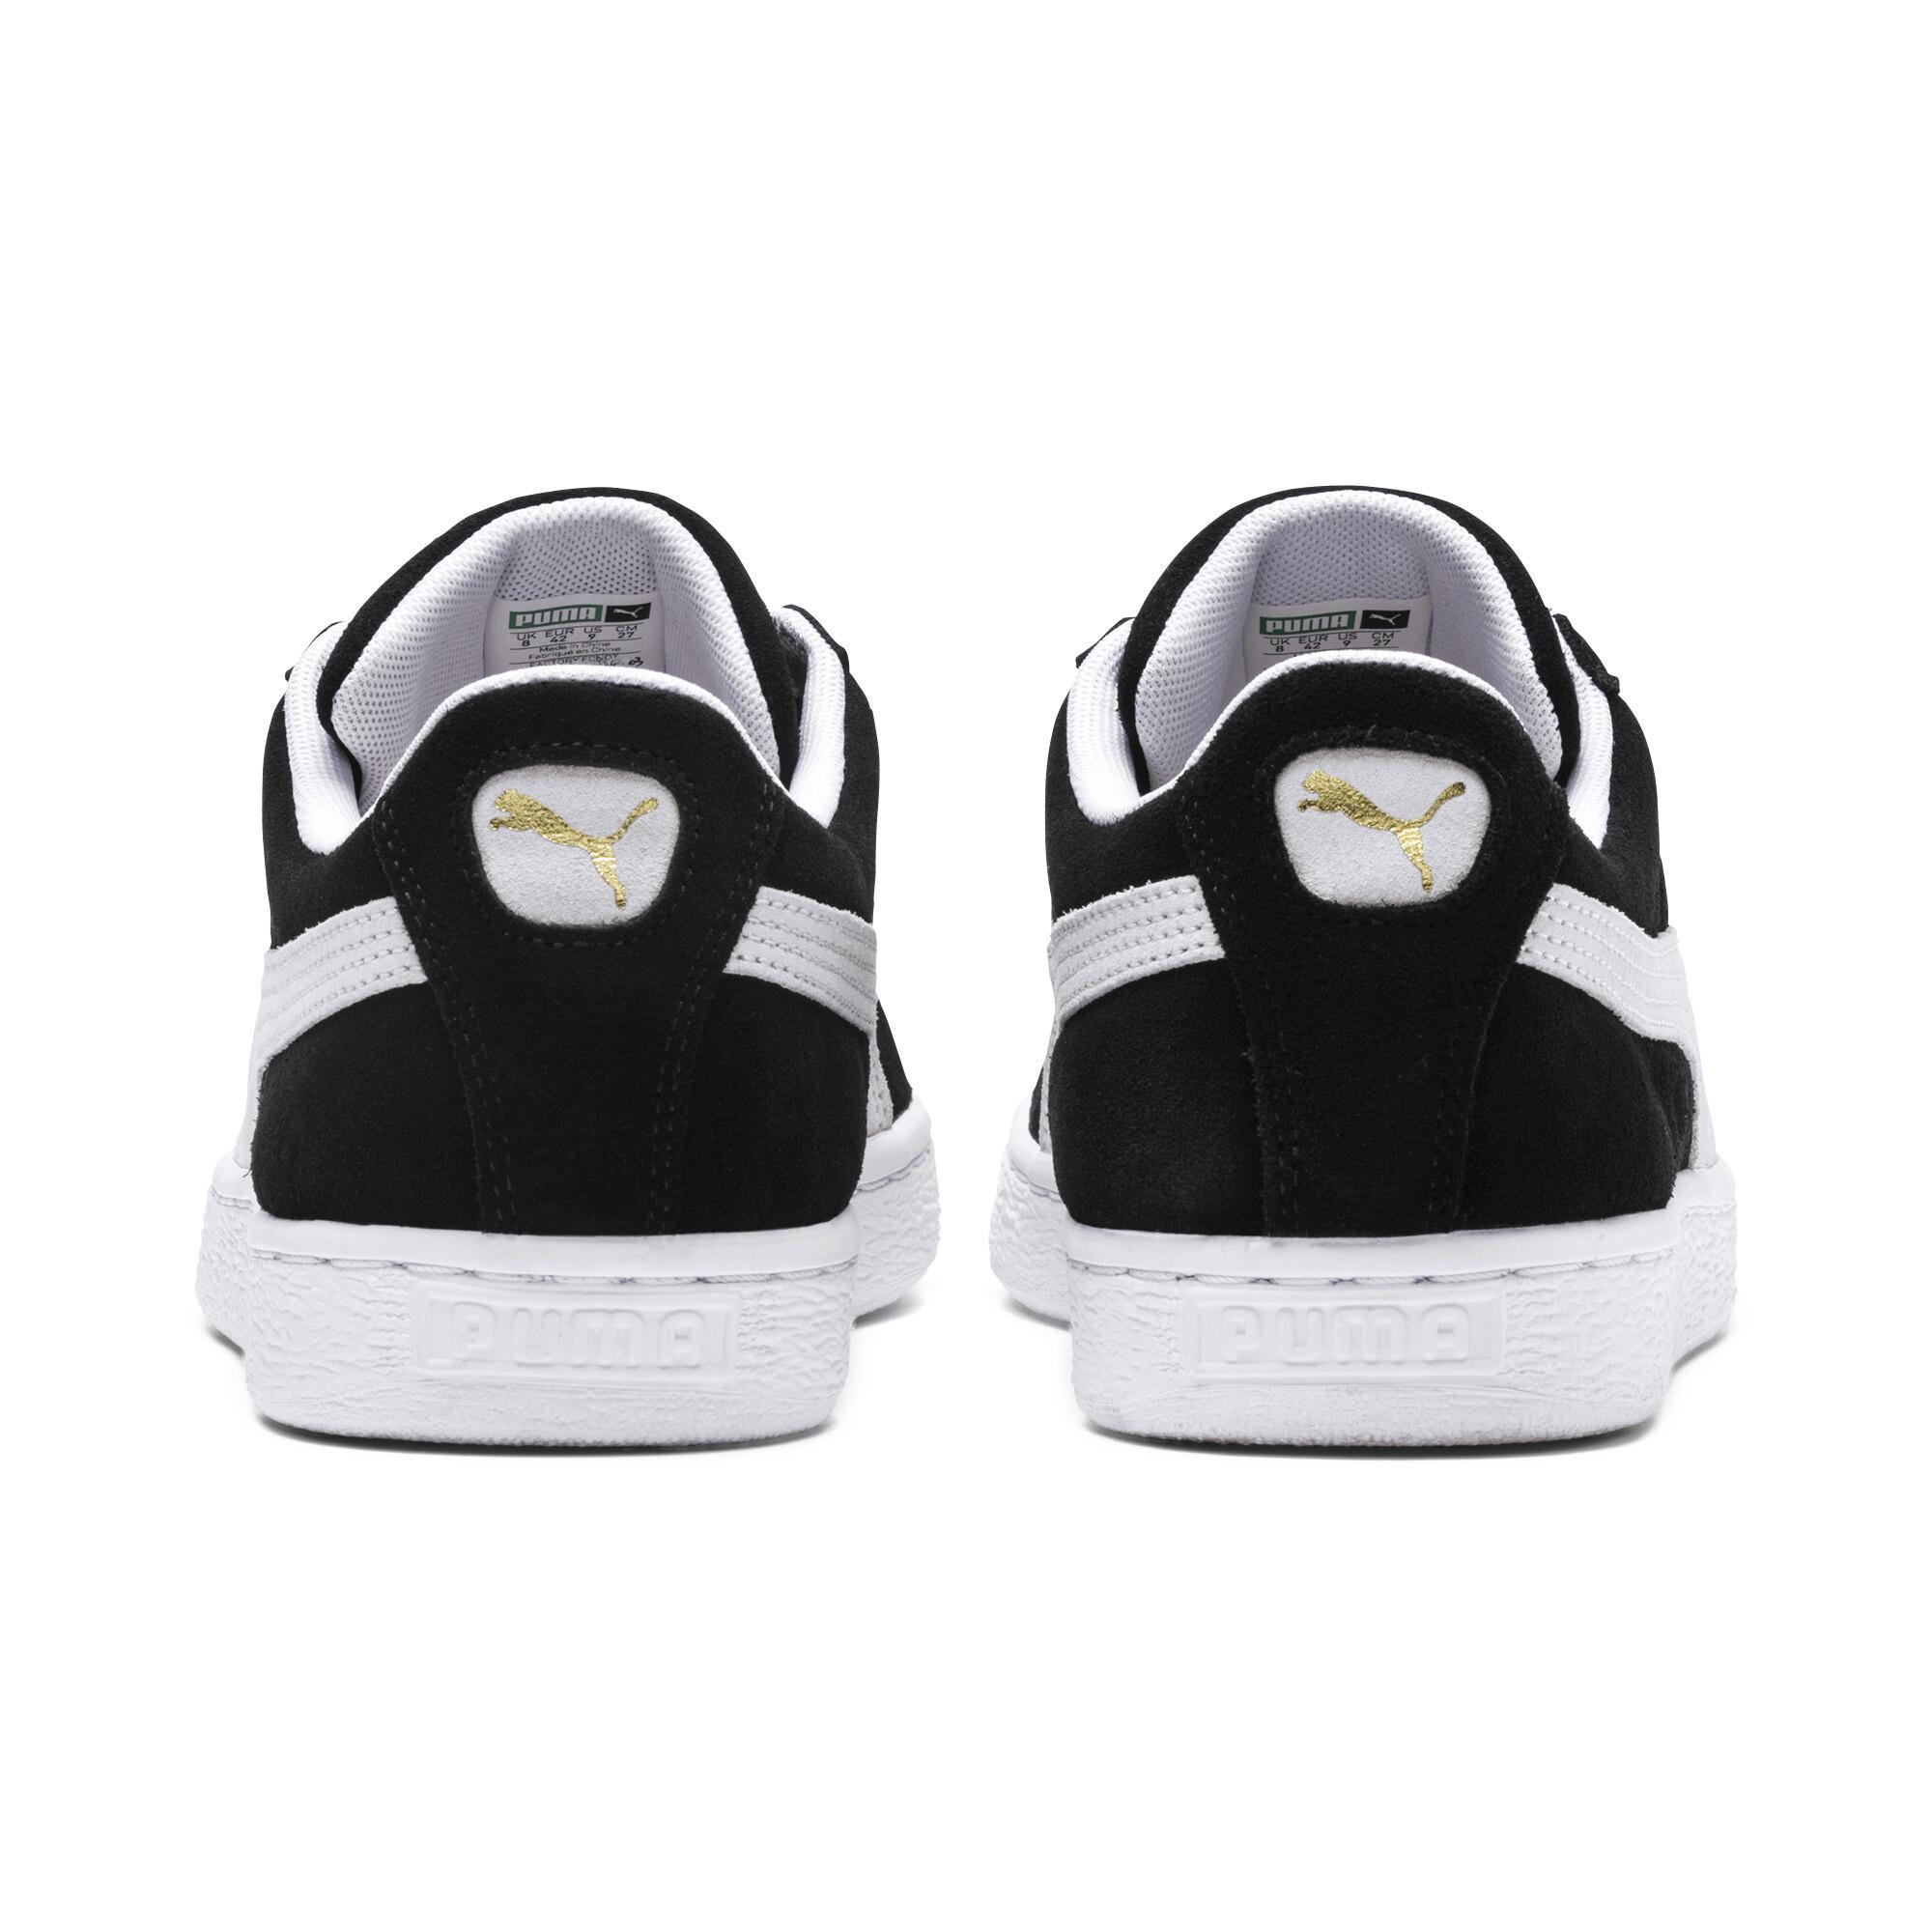 PUMA-Suede-Classic-Sneakers-Men-Shoe-Sport-Shoe thumbnail 6